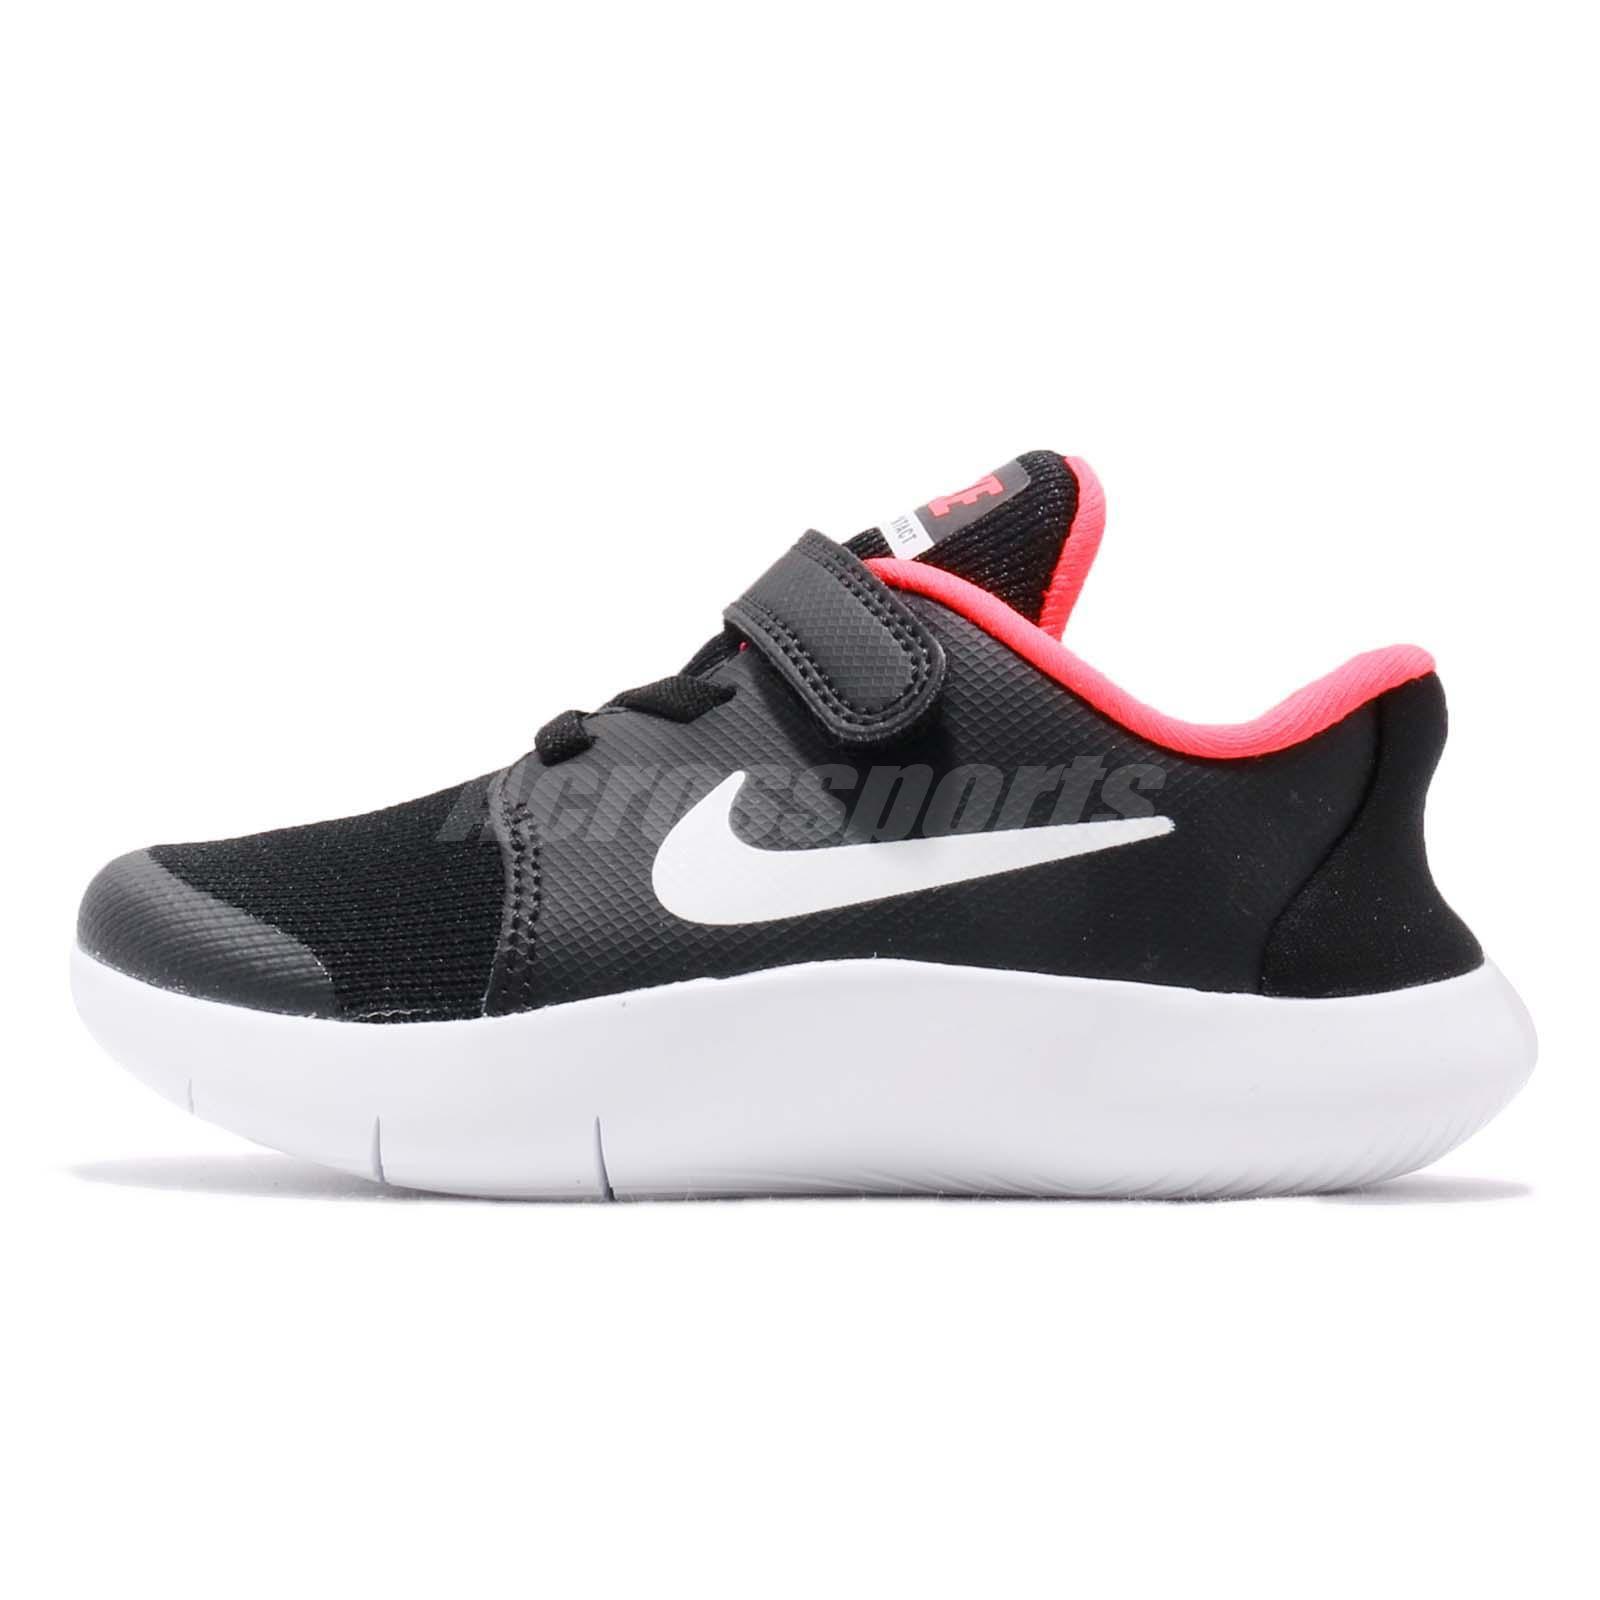 buy popular 99c16 d62ec Nike Flex Contact 2 TDV II Black White Toddler Infant Running Shoes  AH3450-001